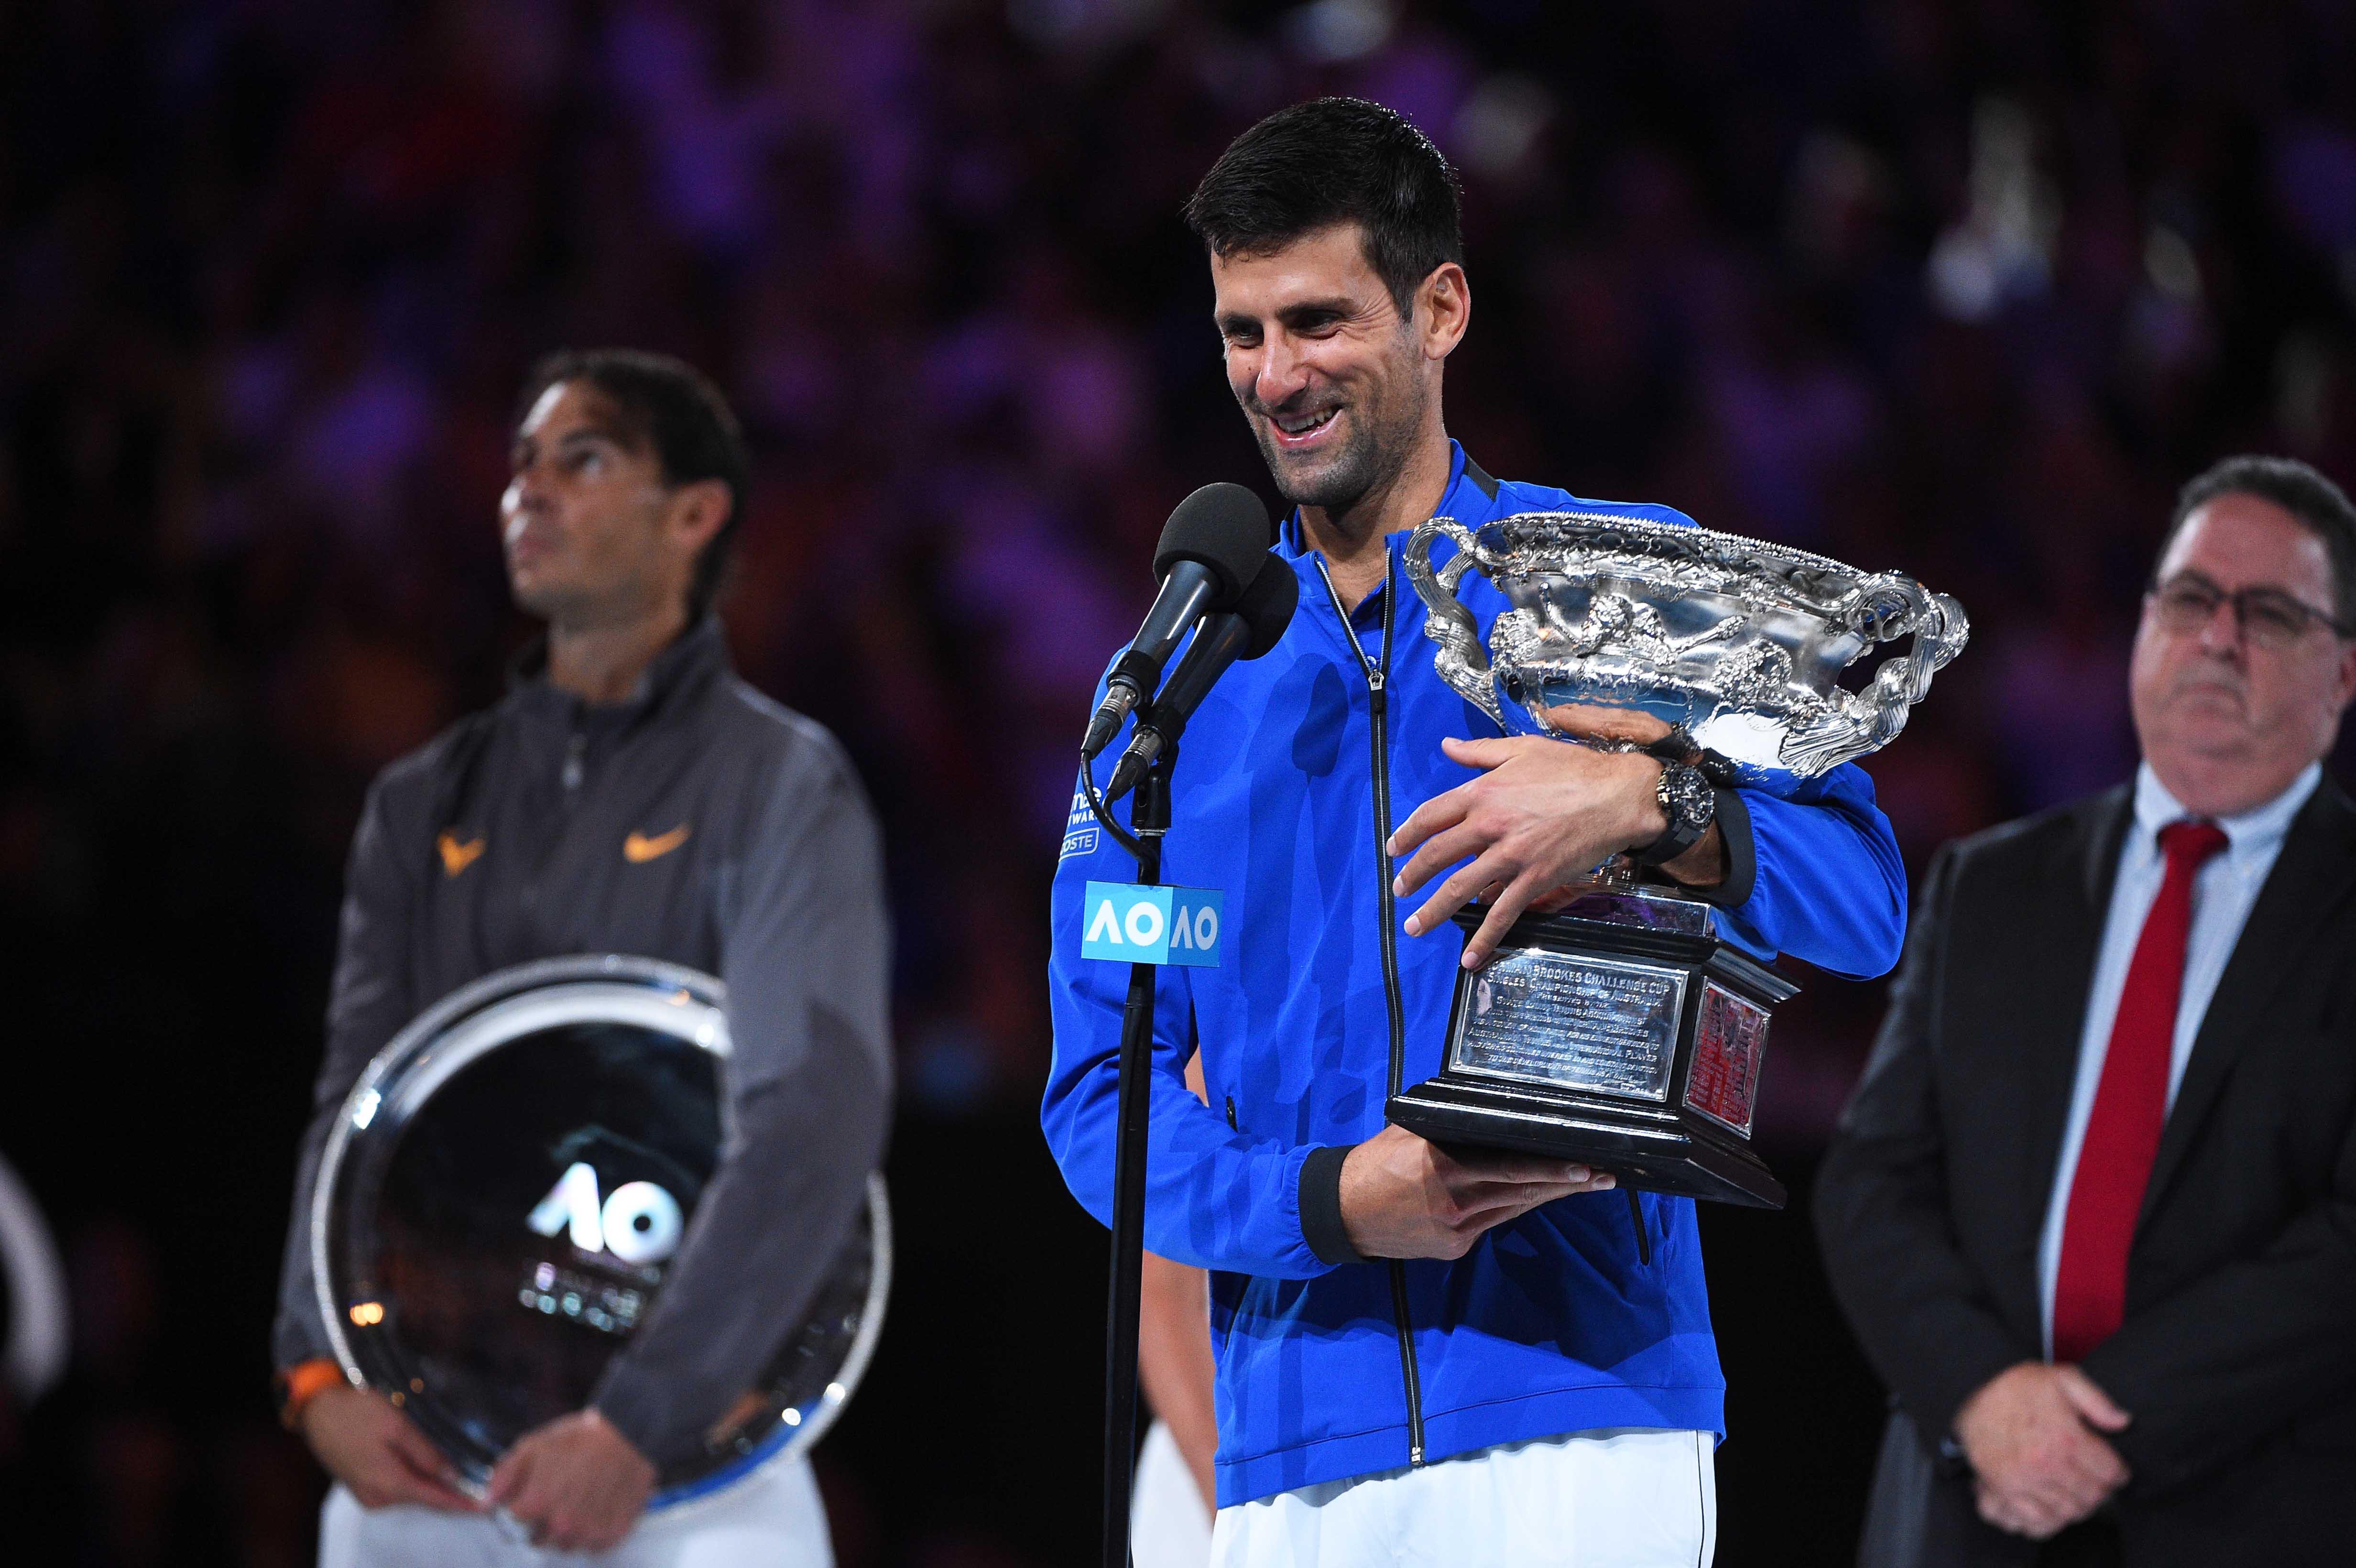 Novak Djokovic talknin g during his speech at the 2019 Australian Open